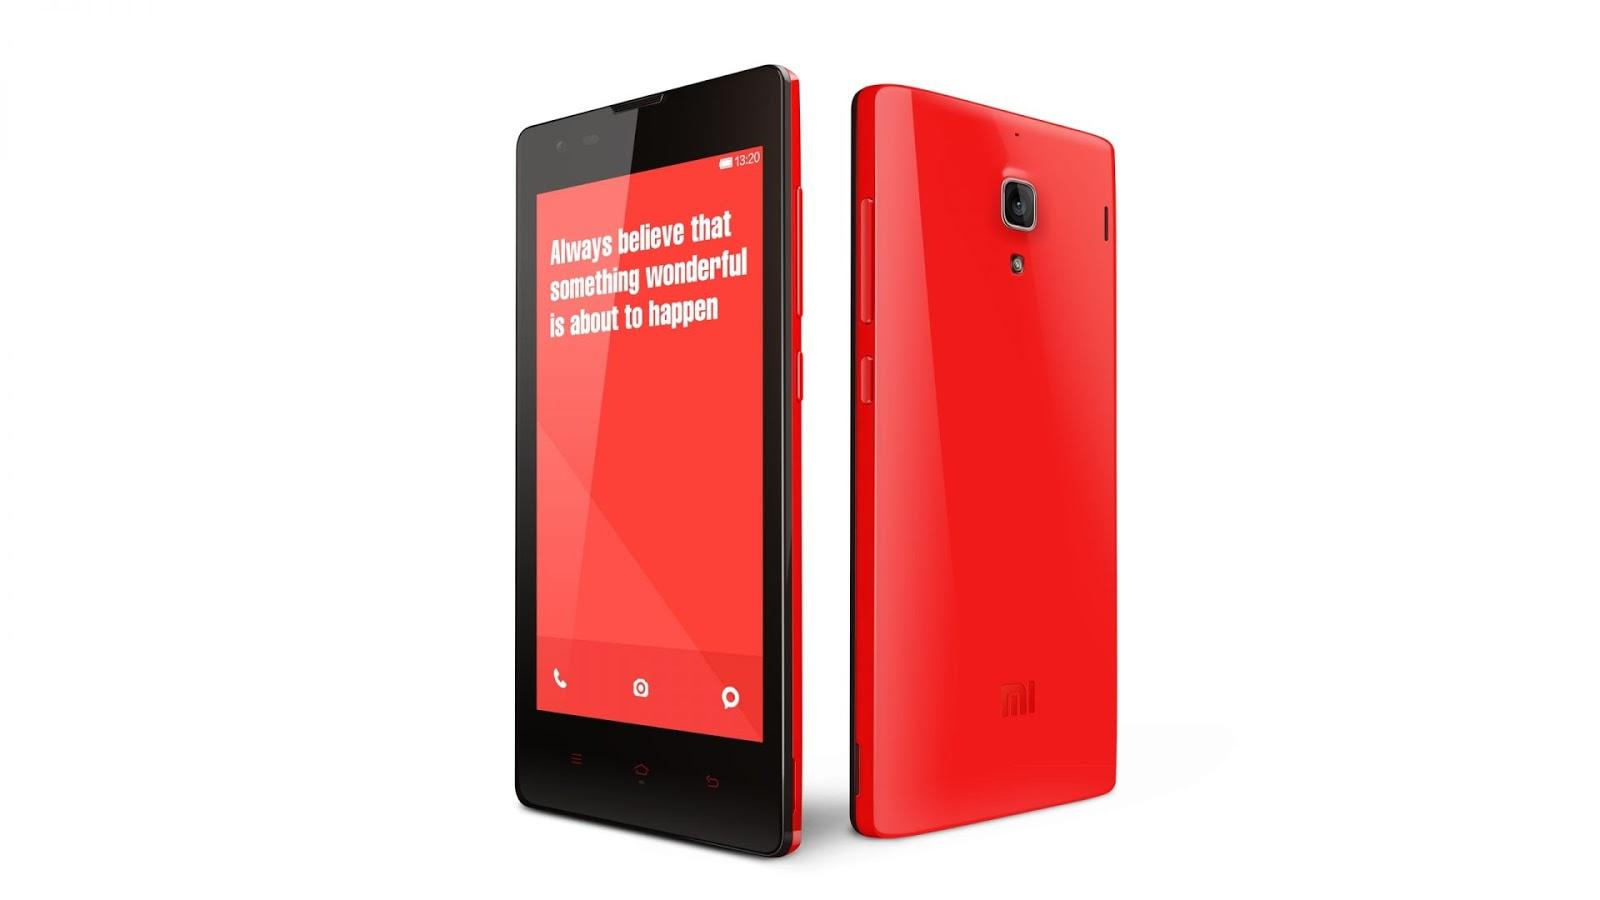 Review Kelebihan Dan Kekurangan Xiaomi Redmi 1s 2 Dan 3